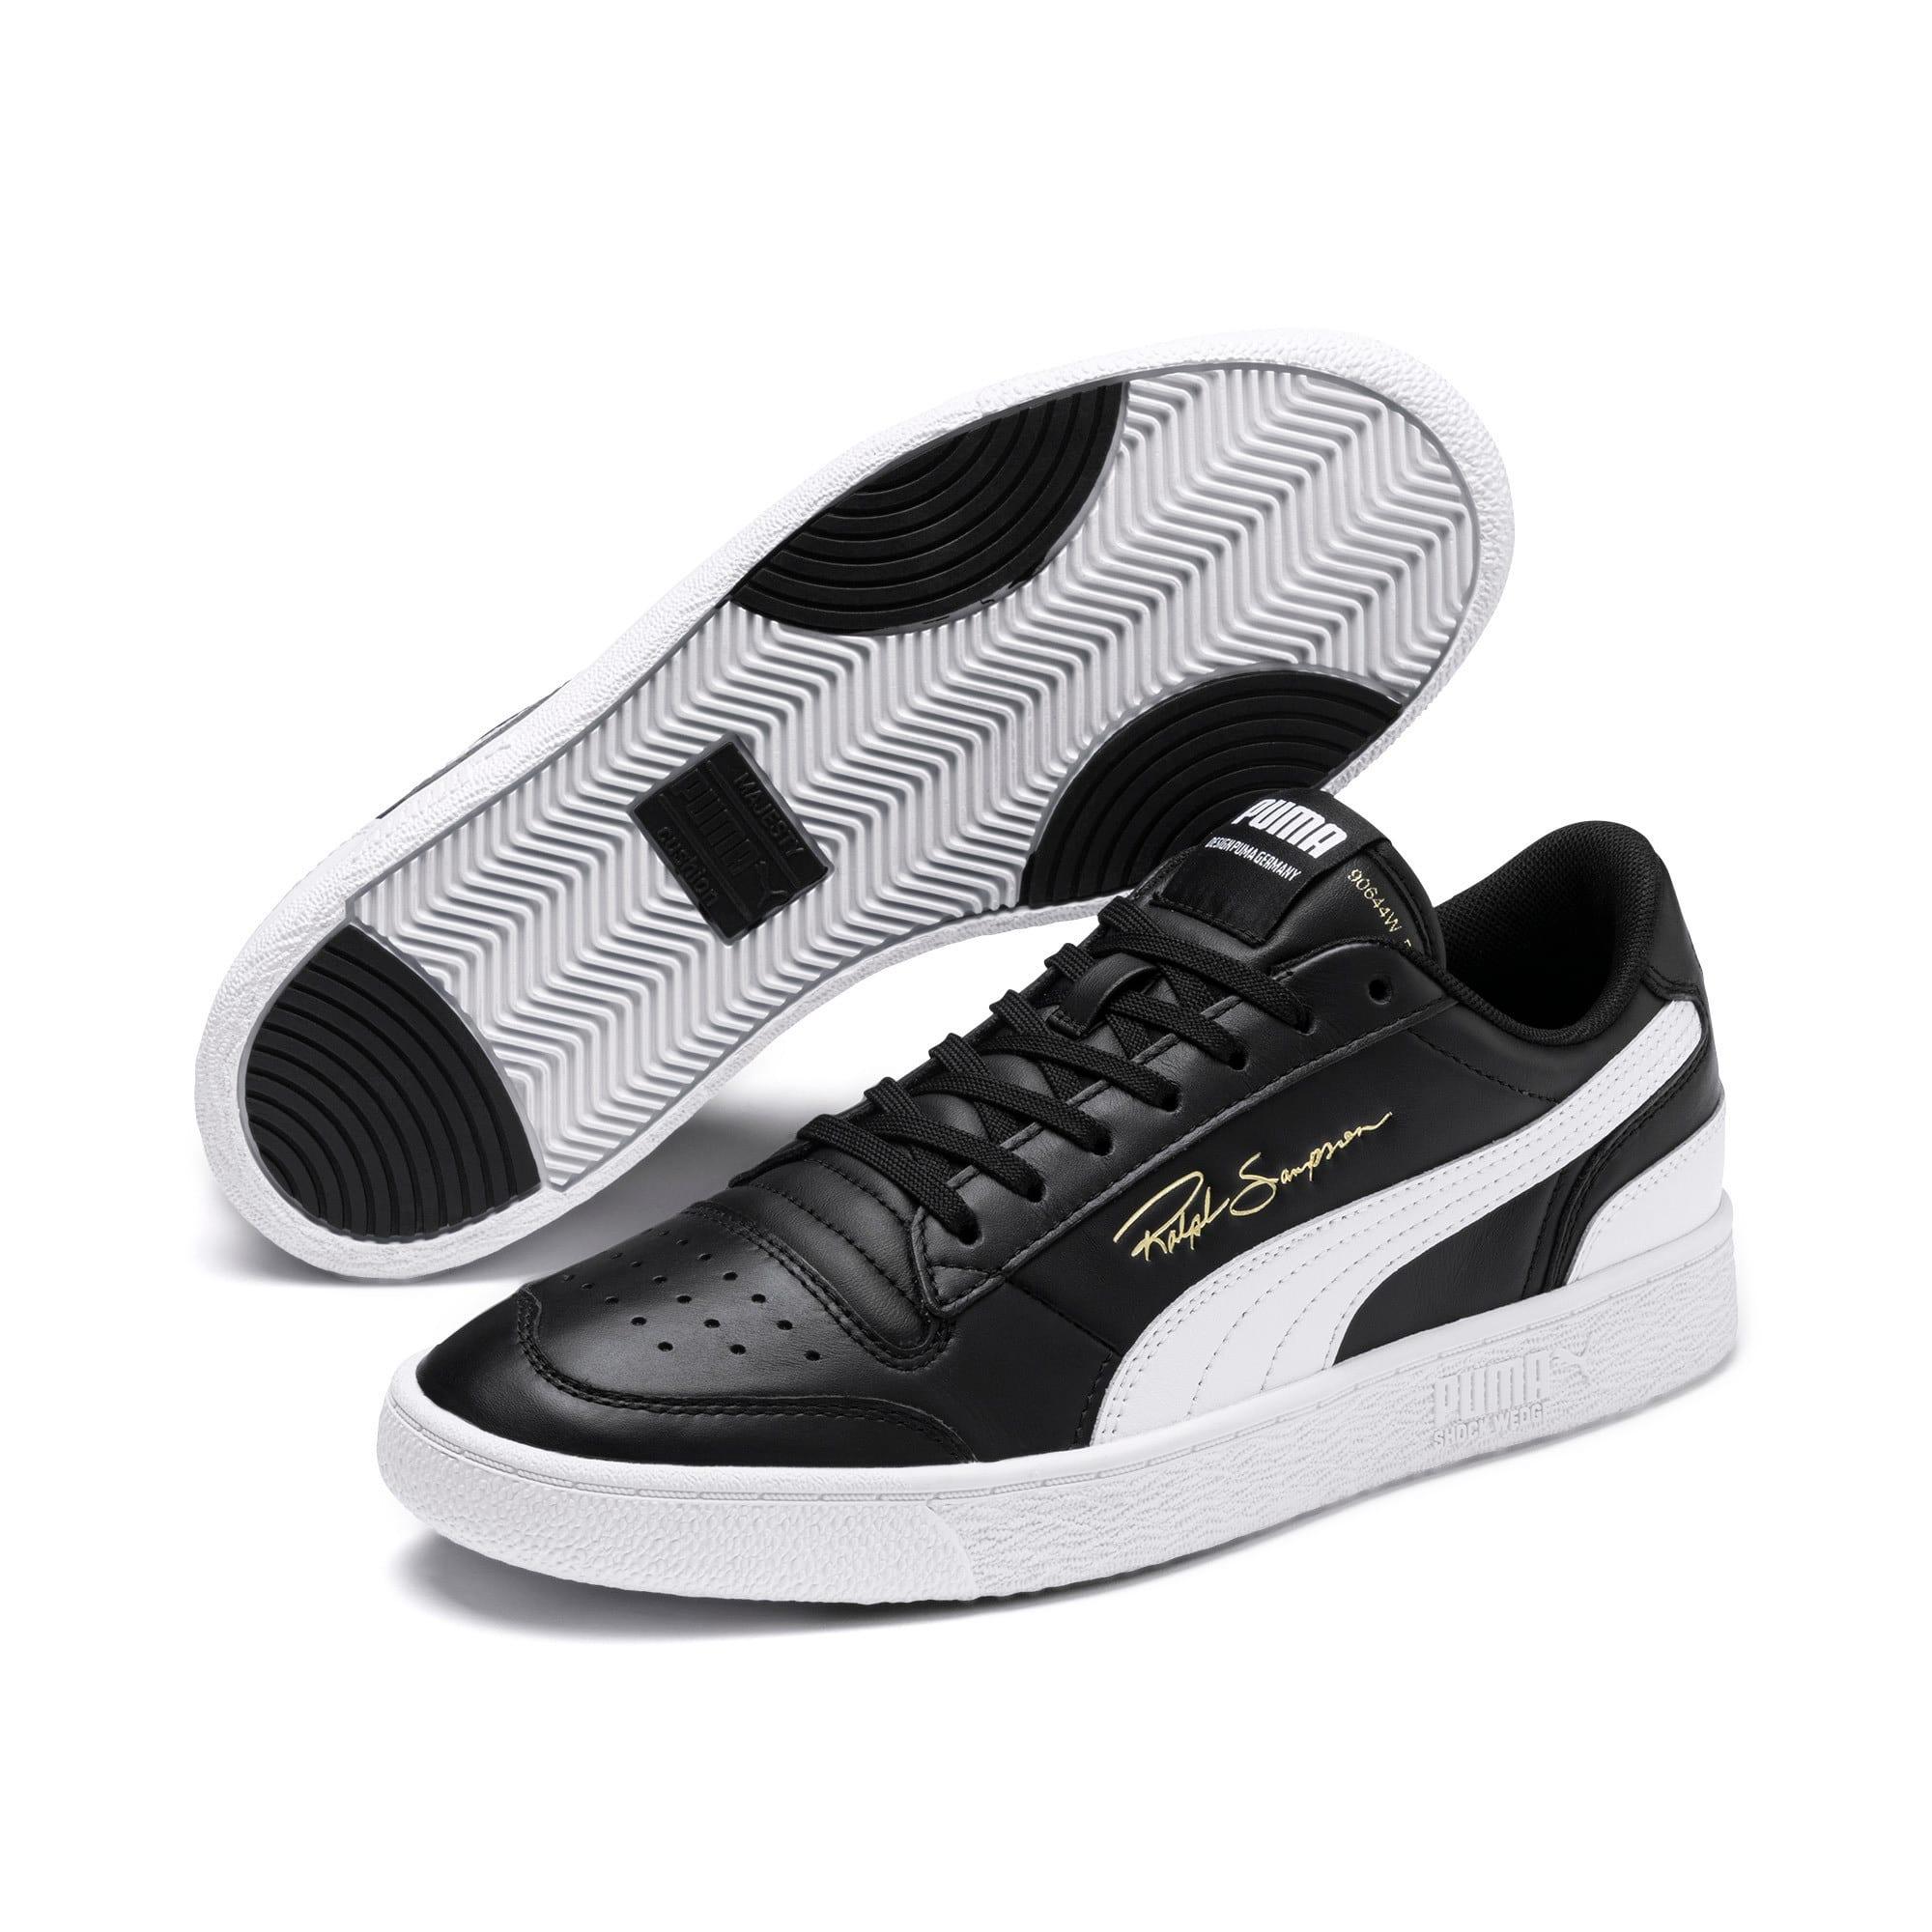 Thumbnail 2 of Ralph Sampson Lo Sneakers, Puma Blk-Puma Wht-Puma Wht, medium